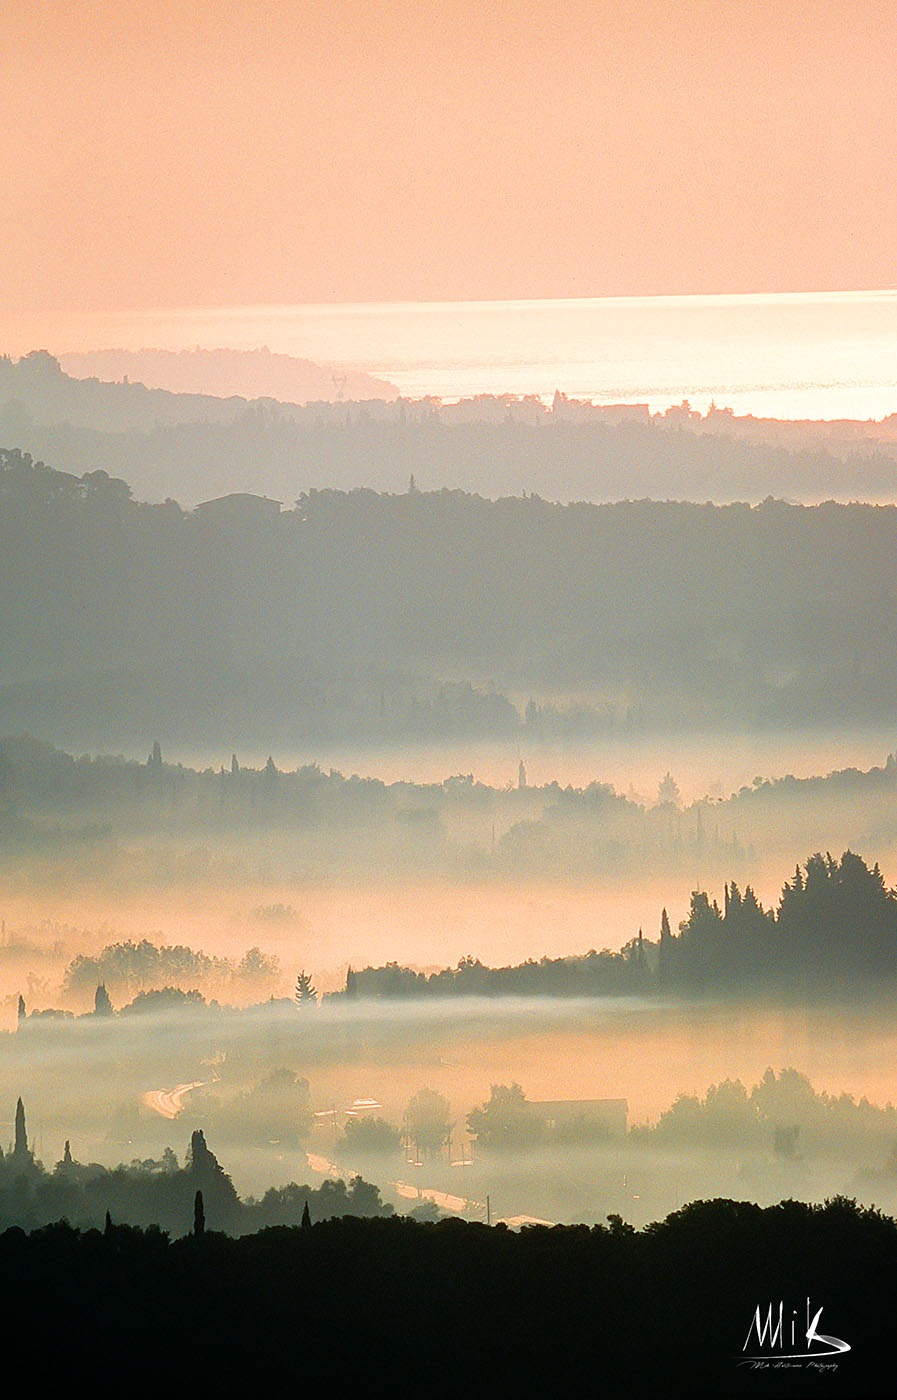 corfu landscape by Mik Hartmann